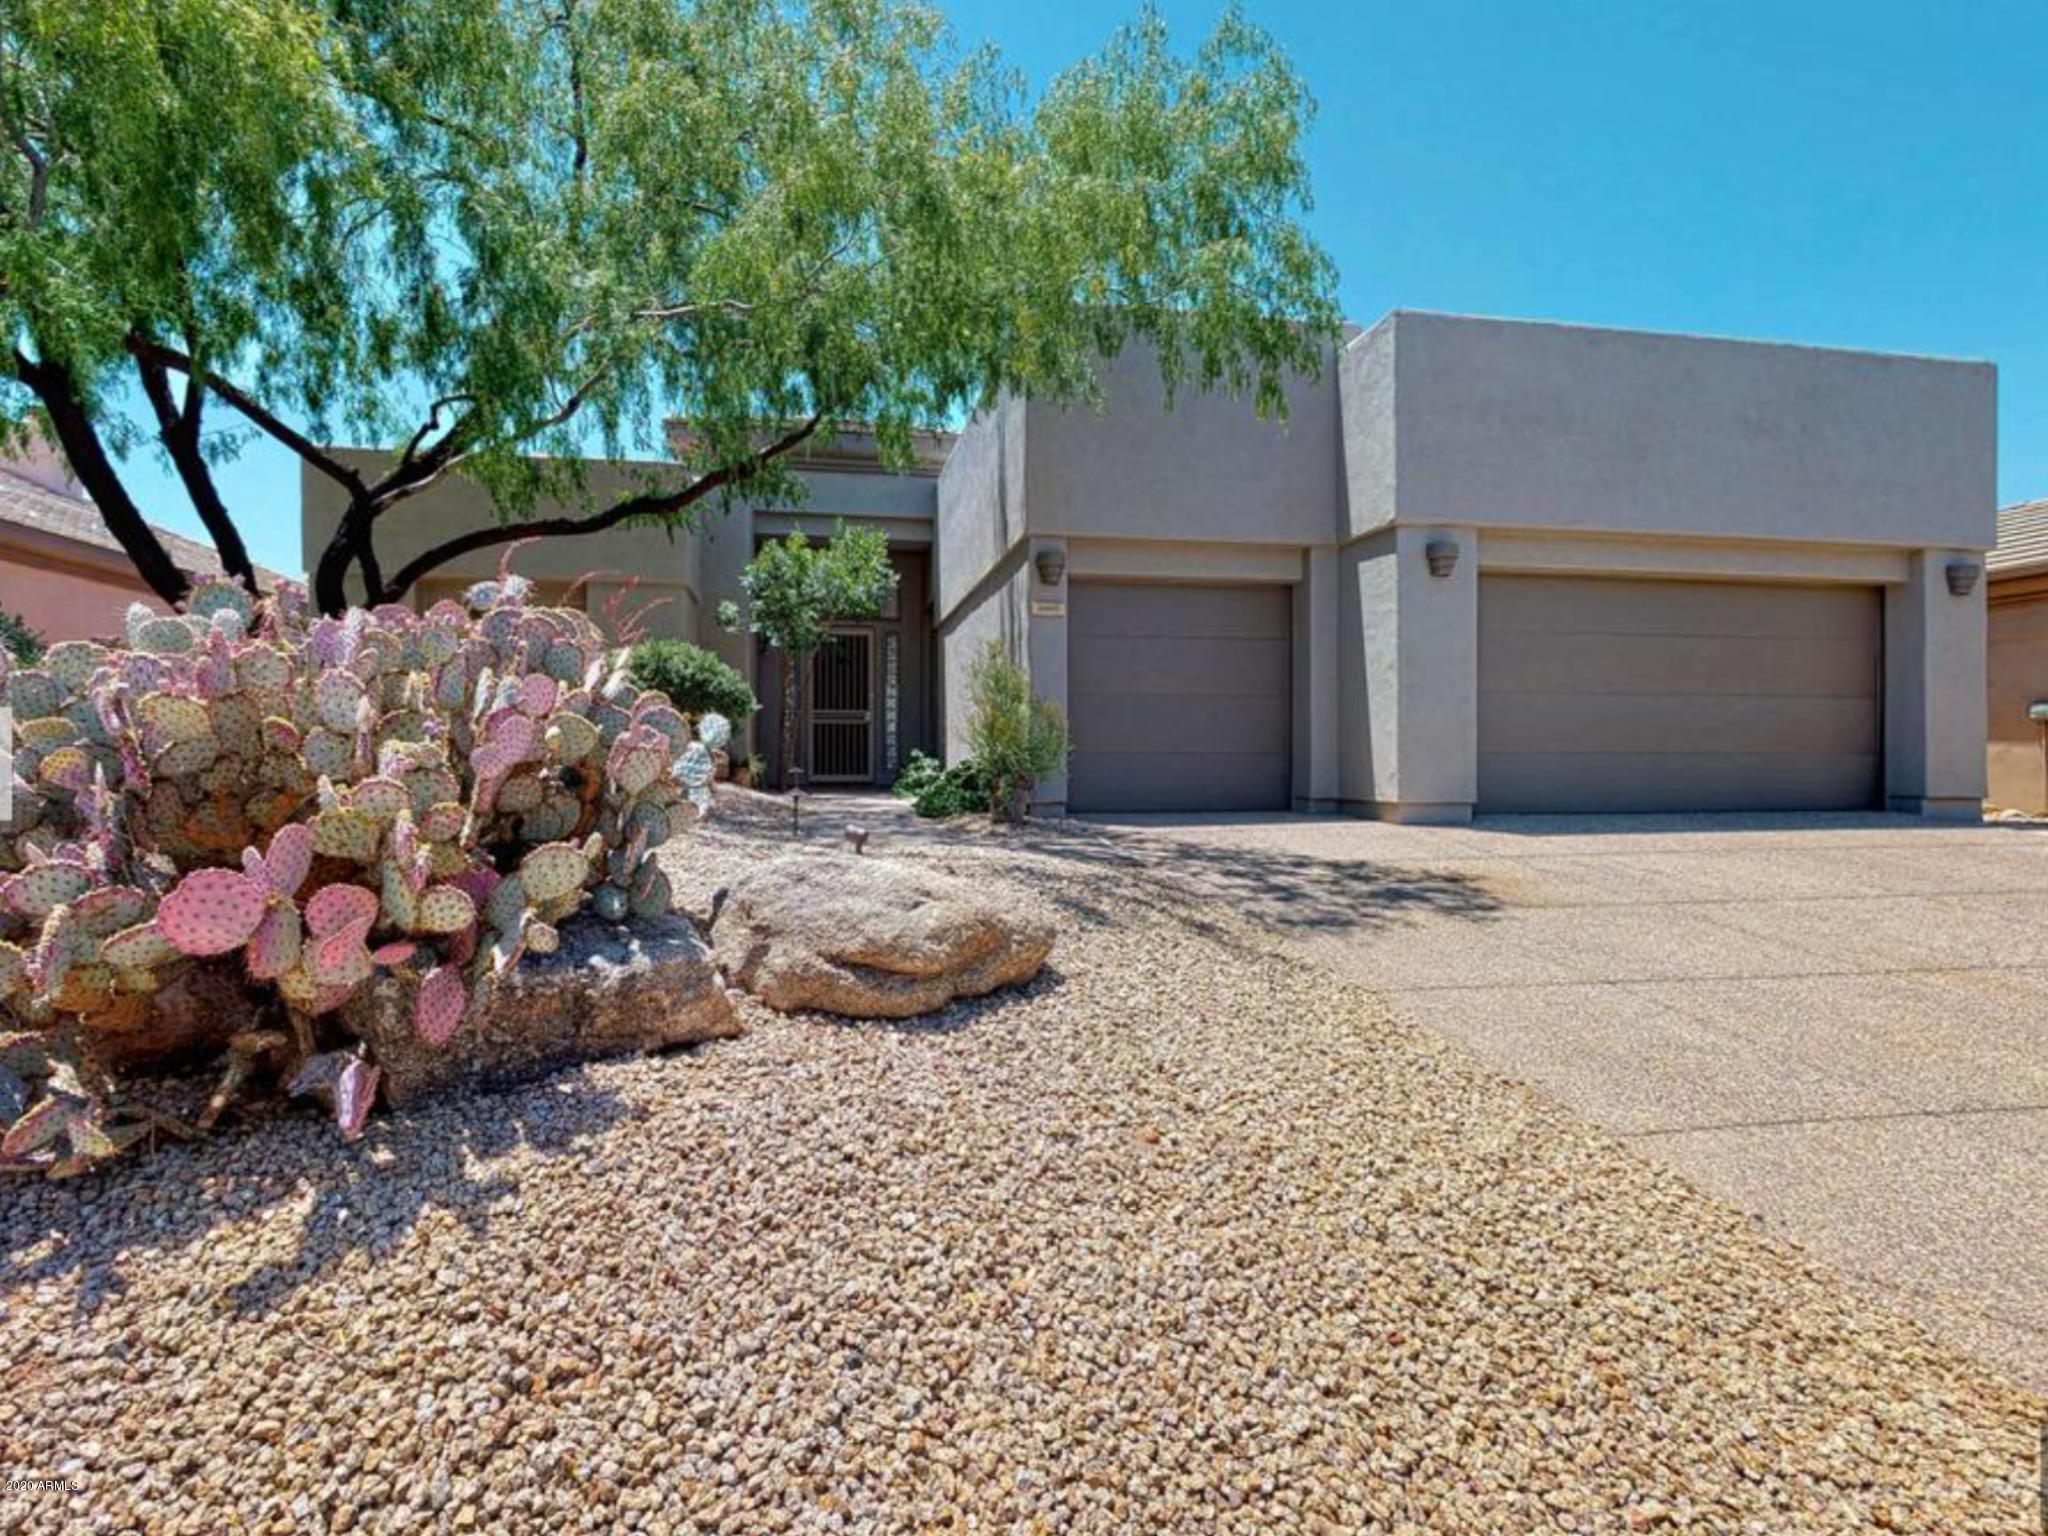 Photo of 6603 E SLEEPY OWL Way, Scottsdale, AZ 85266